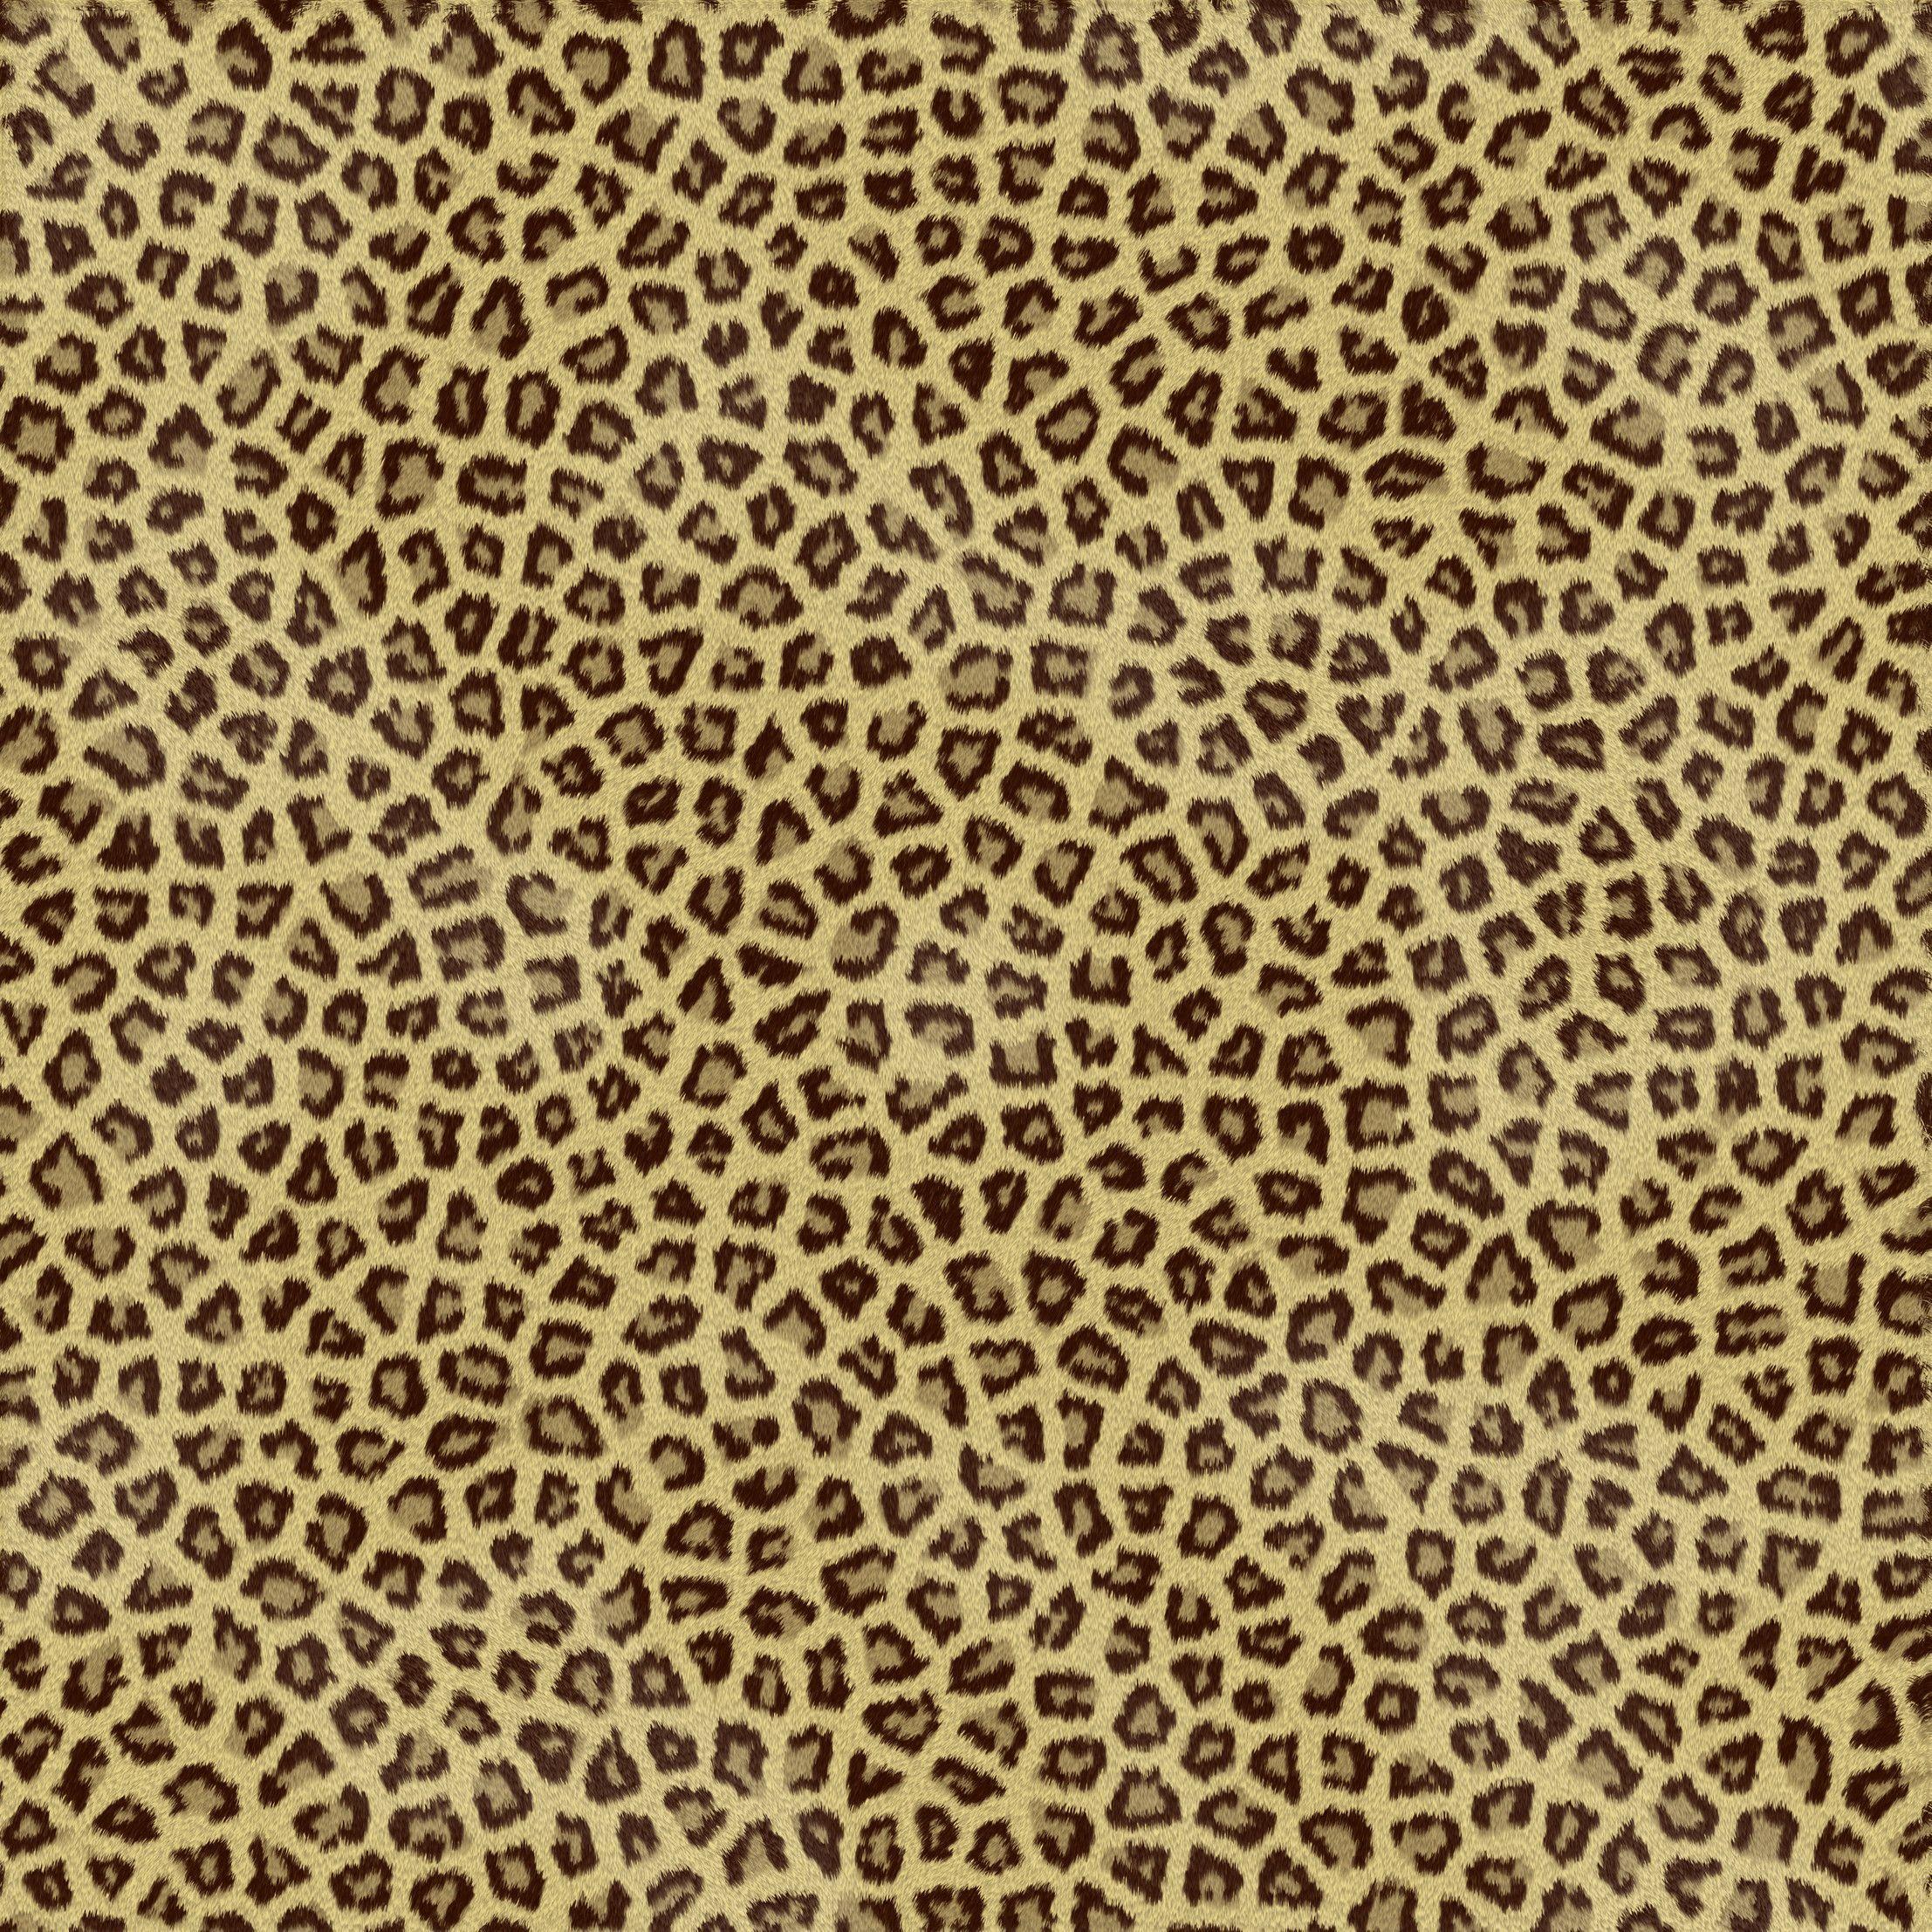 Cheetah Print Hd Wallpaper Mcis Jpg 2214 2214 Cheetah Print Wallpaper Animal Print Wallpaper Print Wallpaper